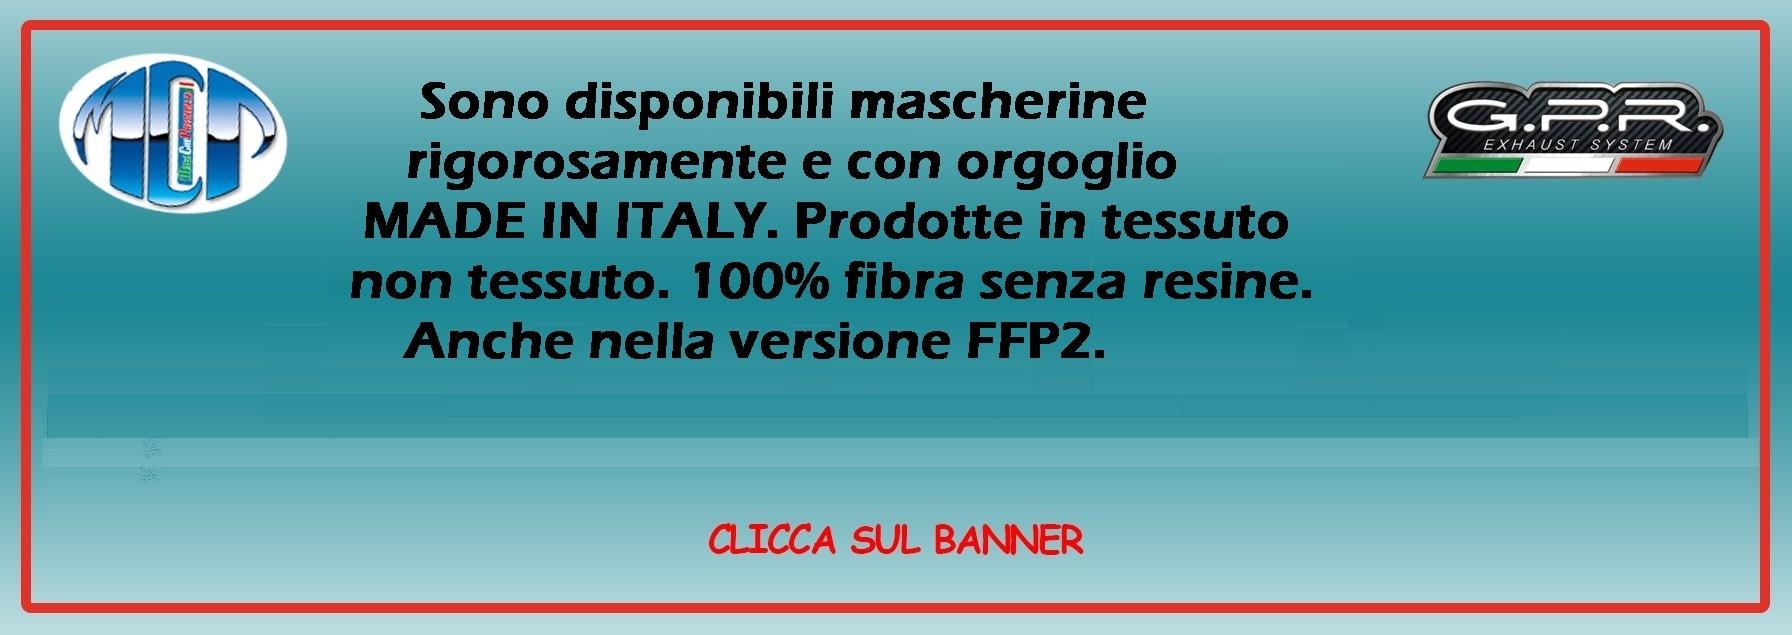 Mascherine MADE IN ITALY